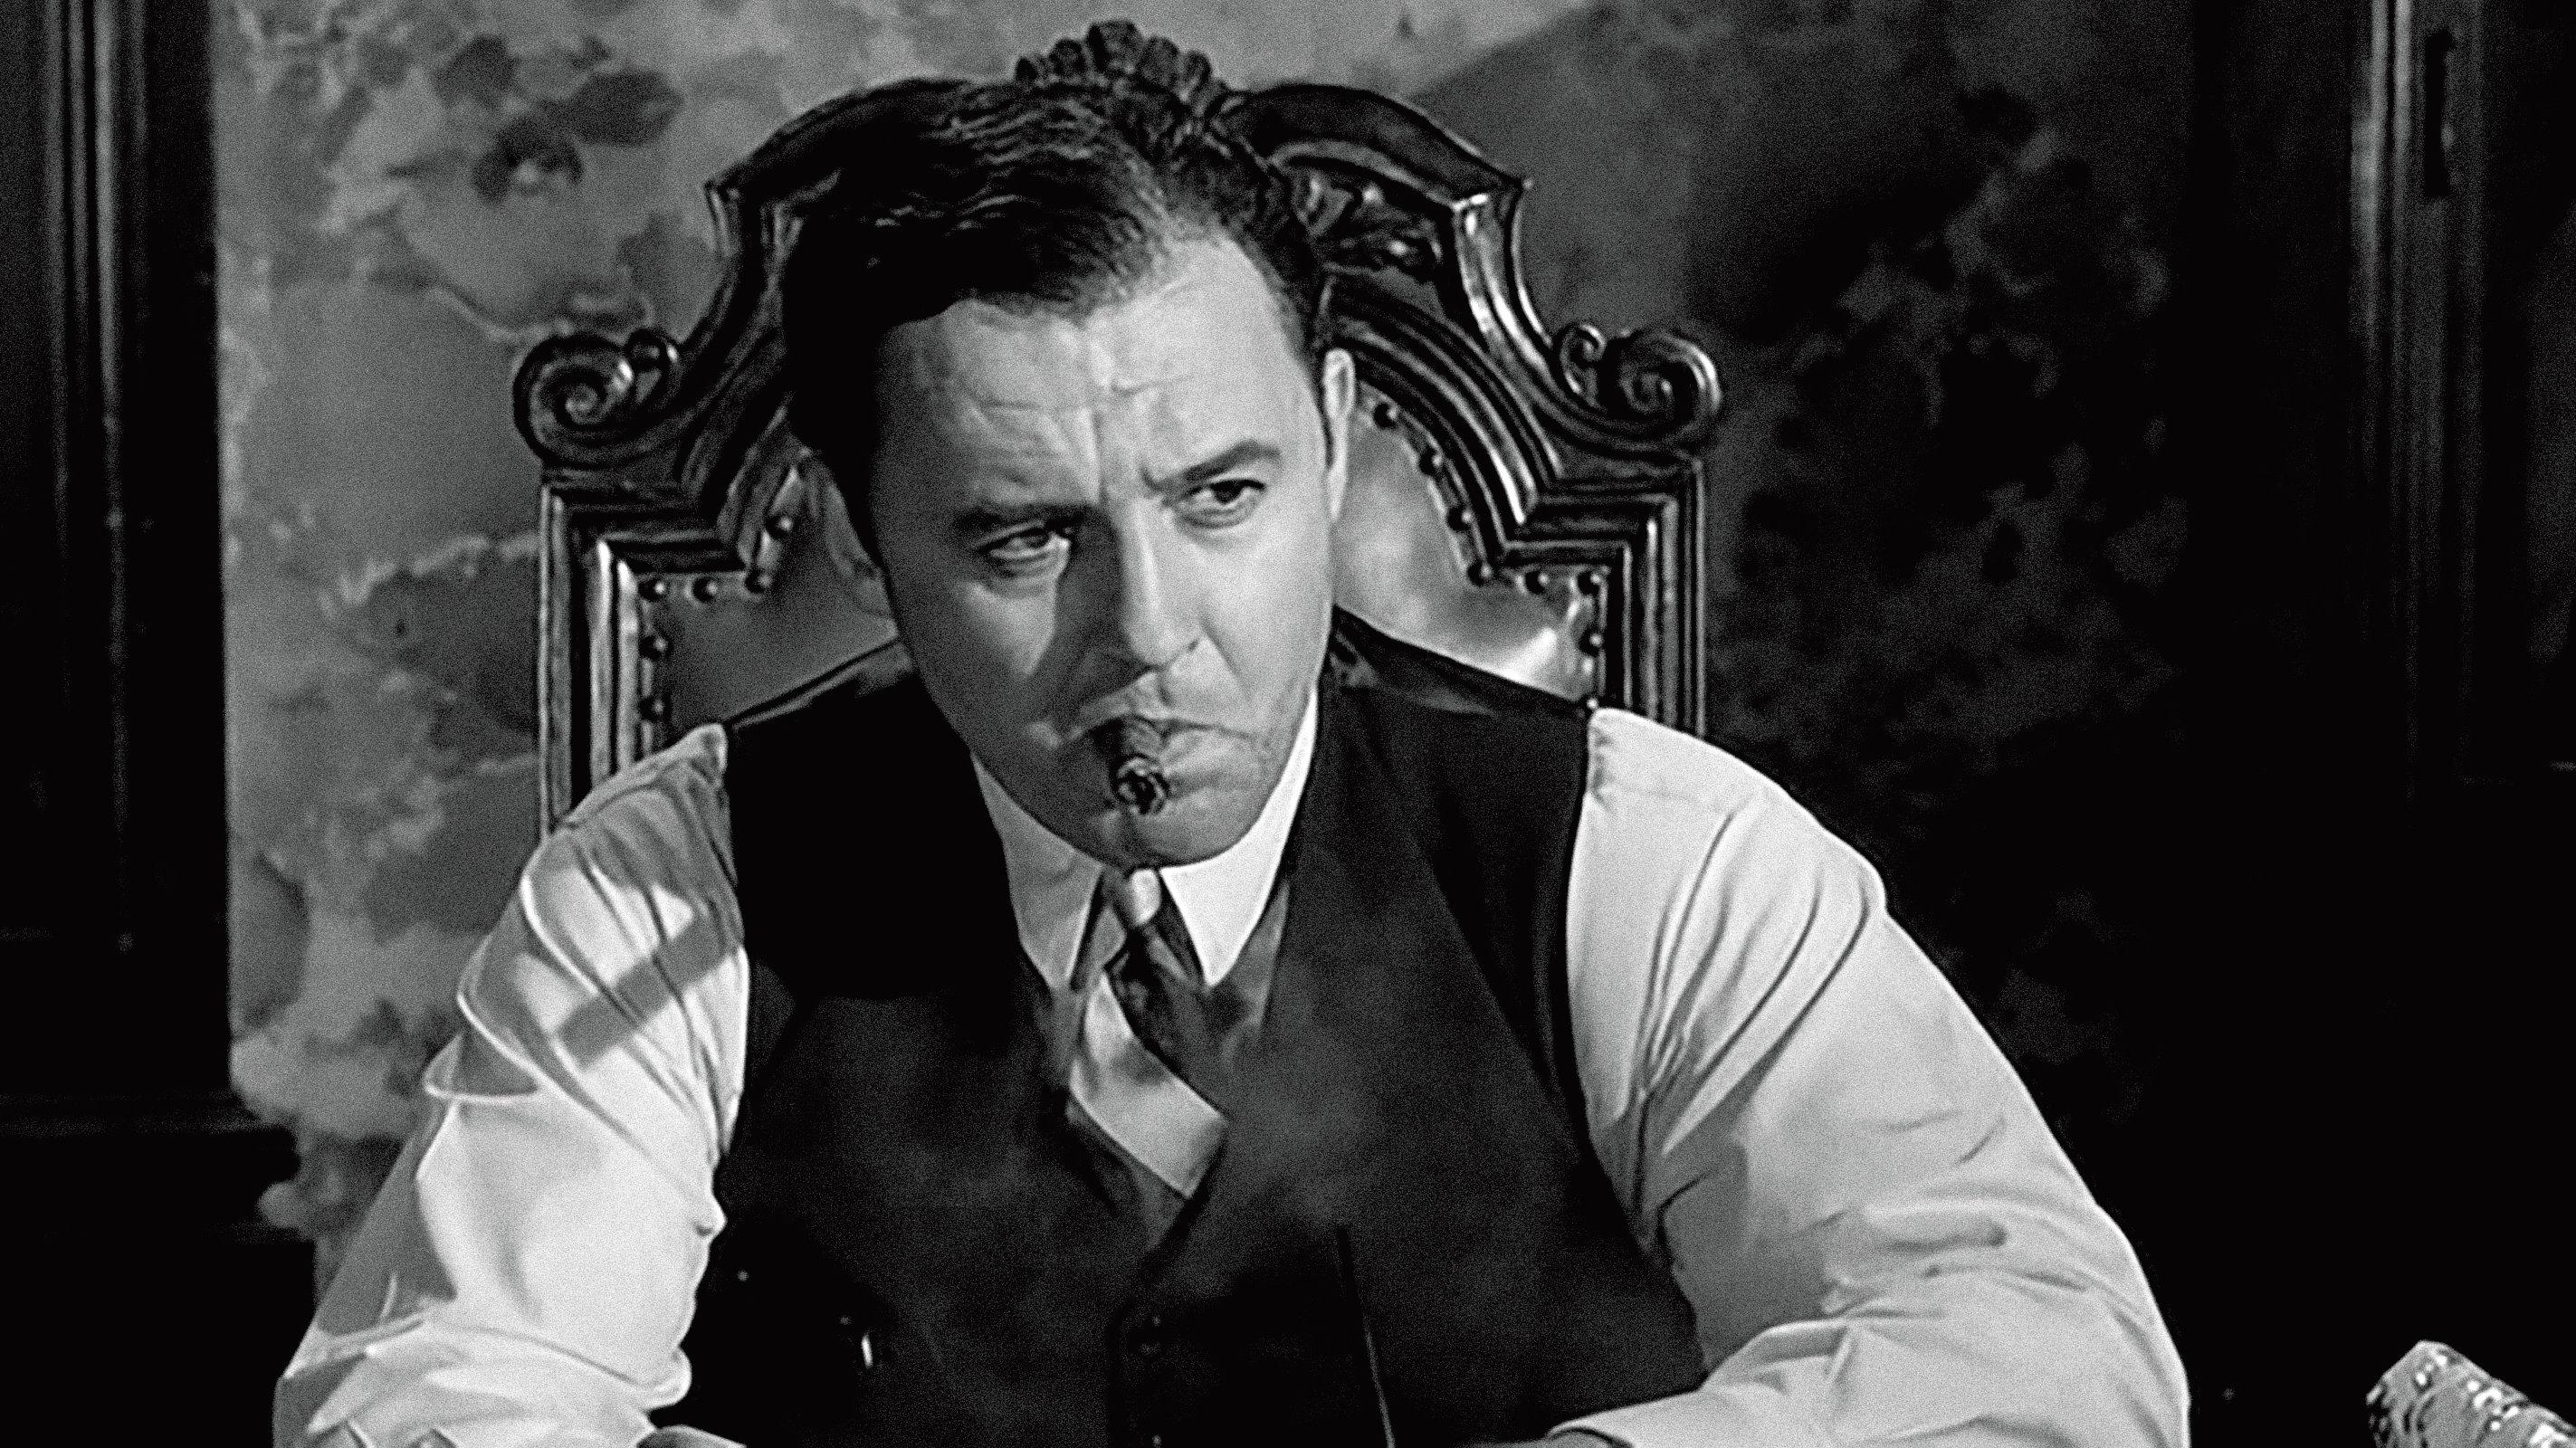 Rod Steiger in Al Capone